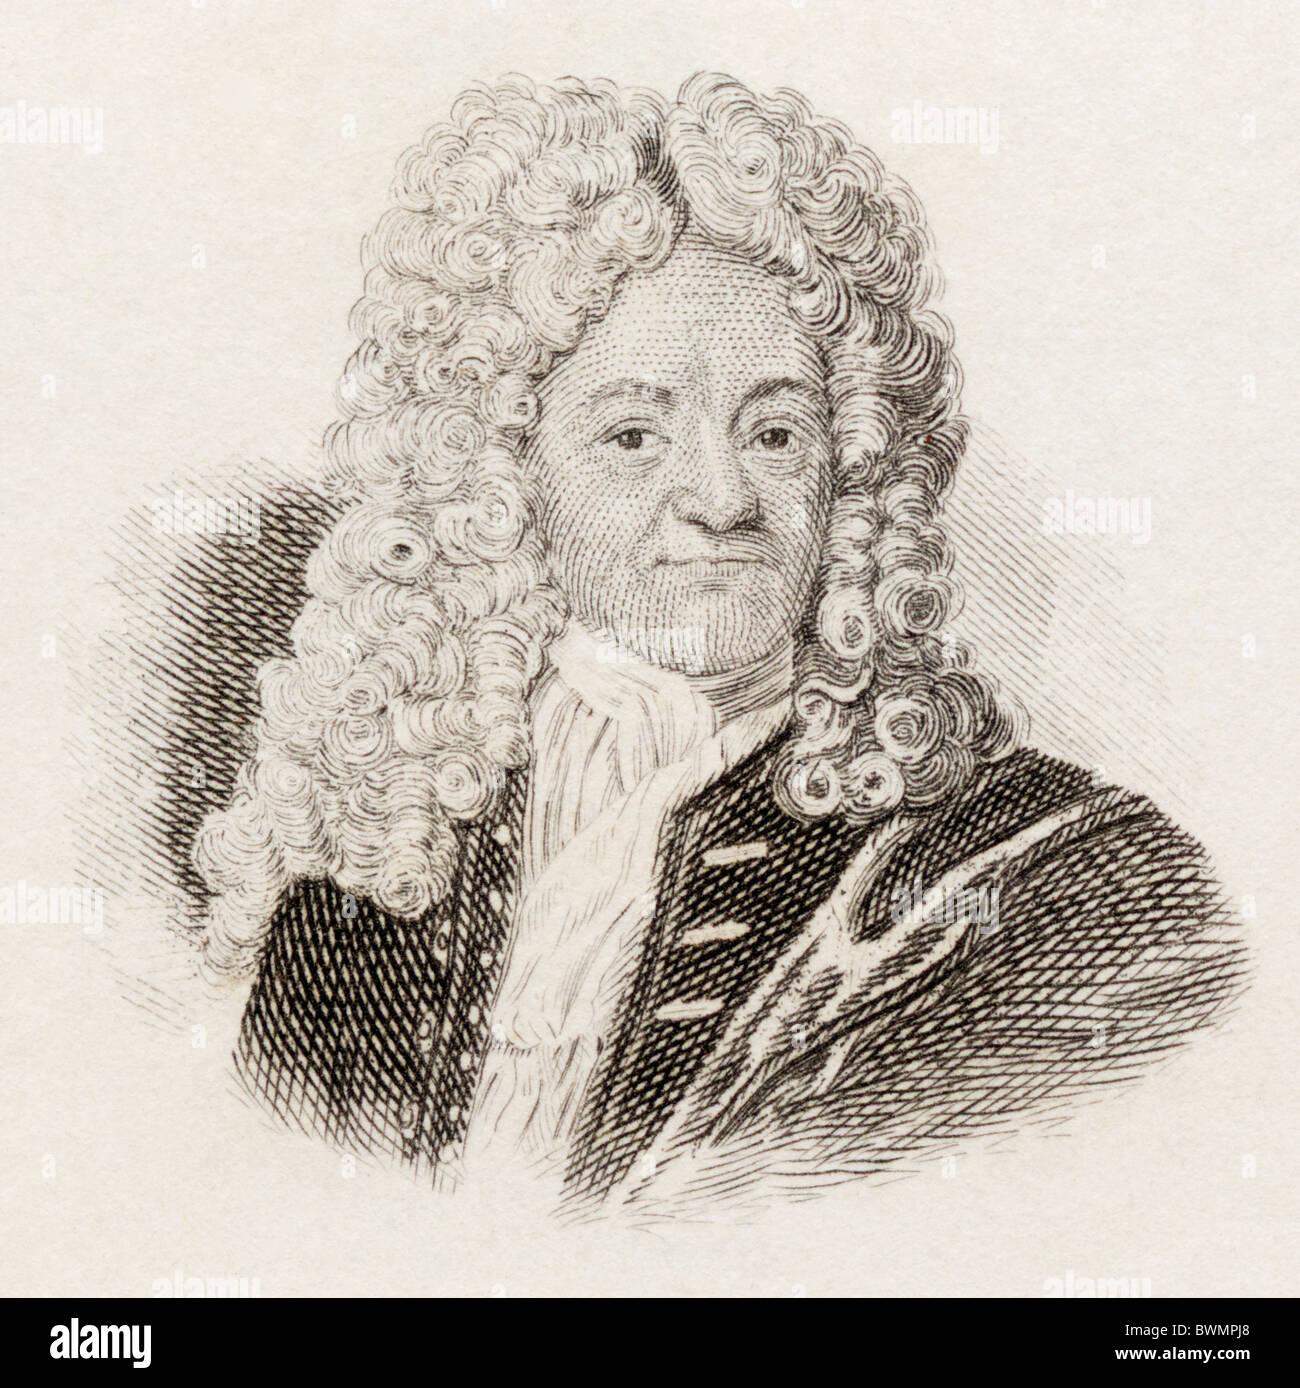 Johann Albert Fabricius, 1668 to 1736. German classical scholar and bibliographer. - Stock Image